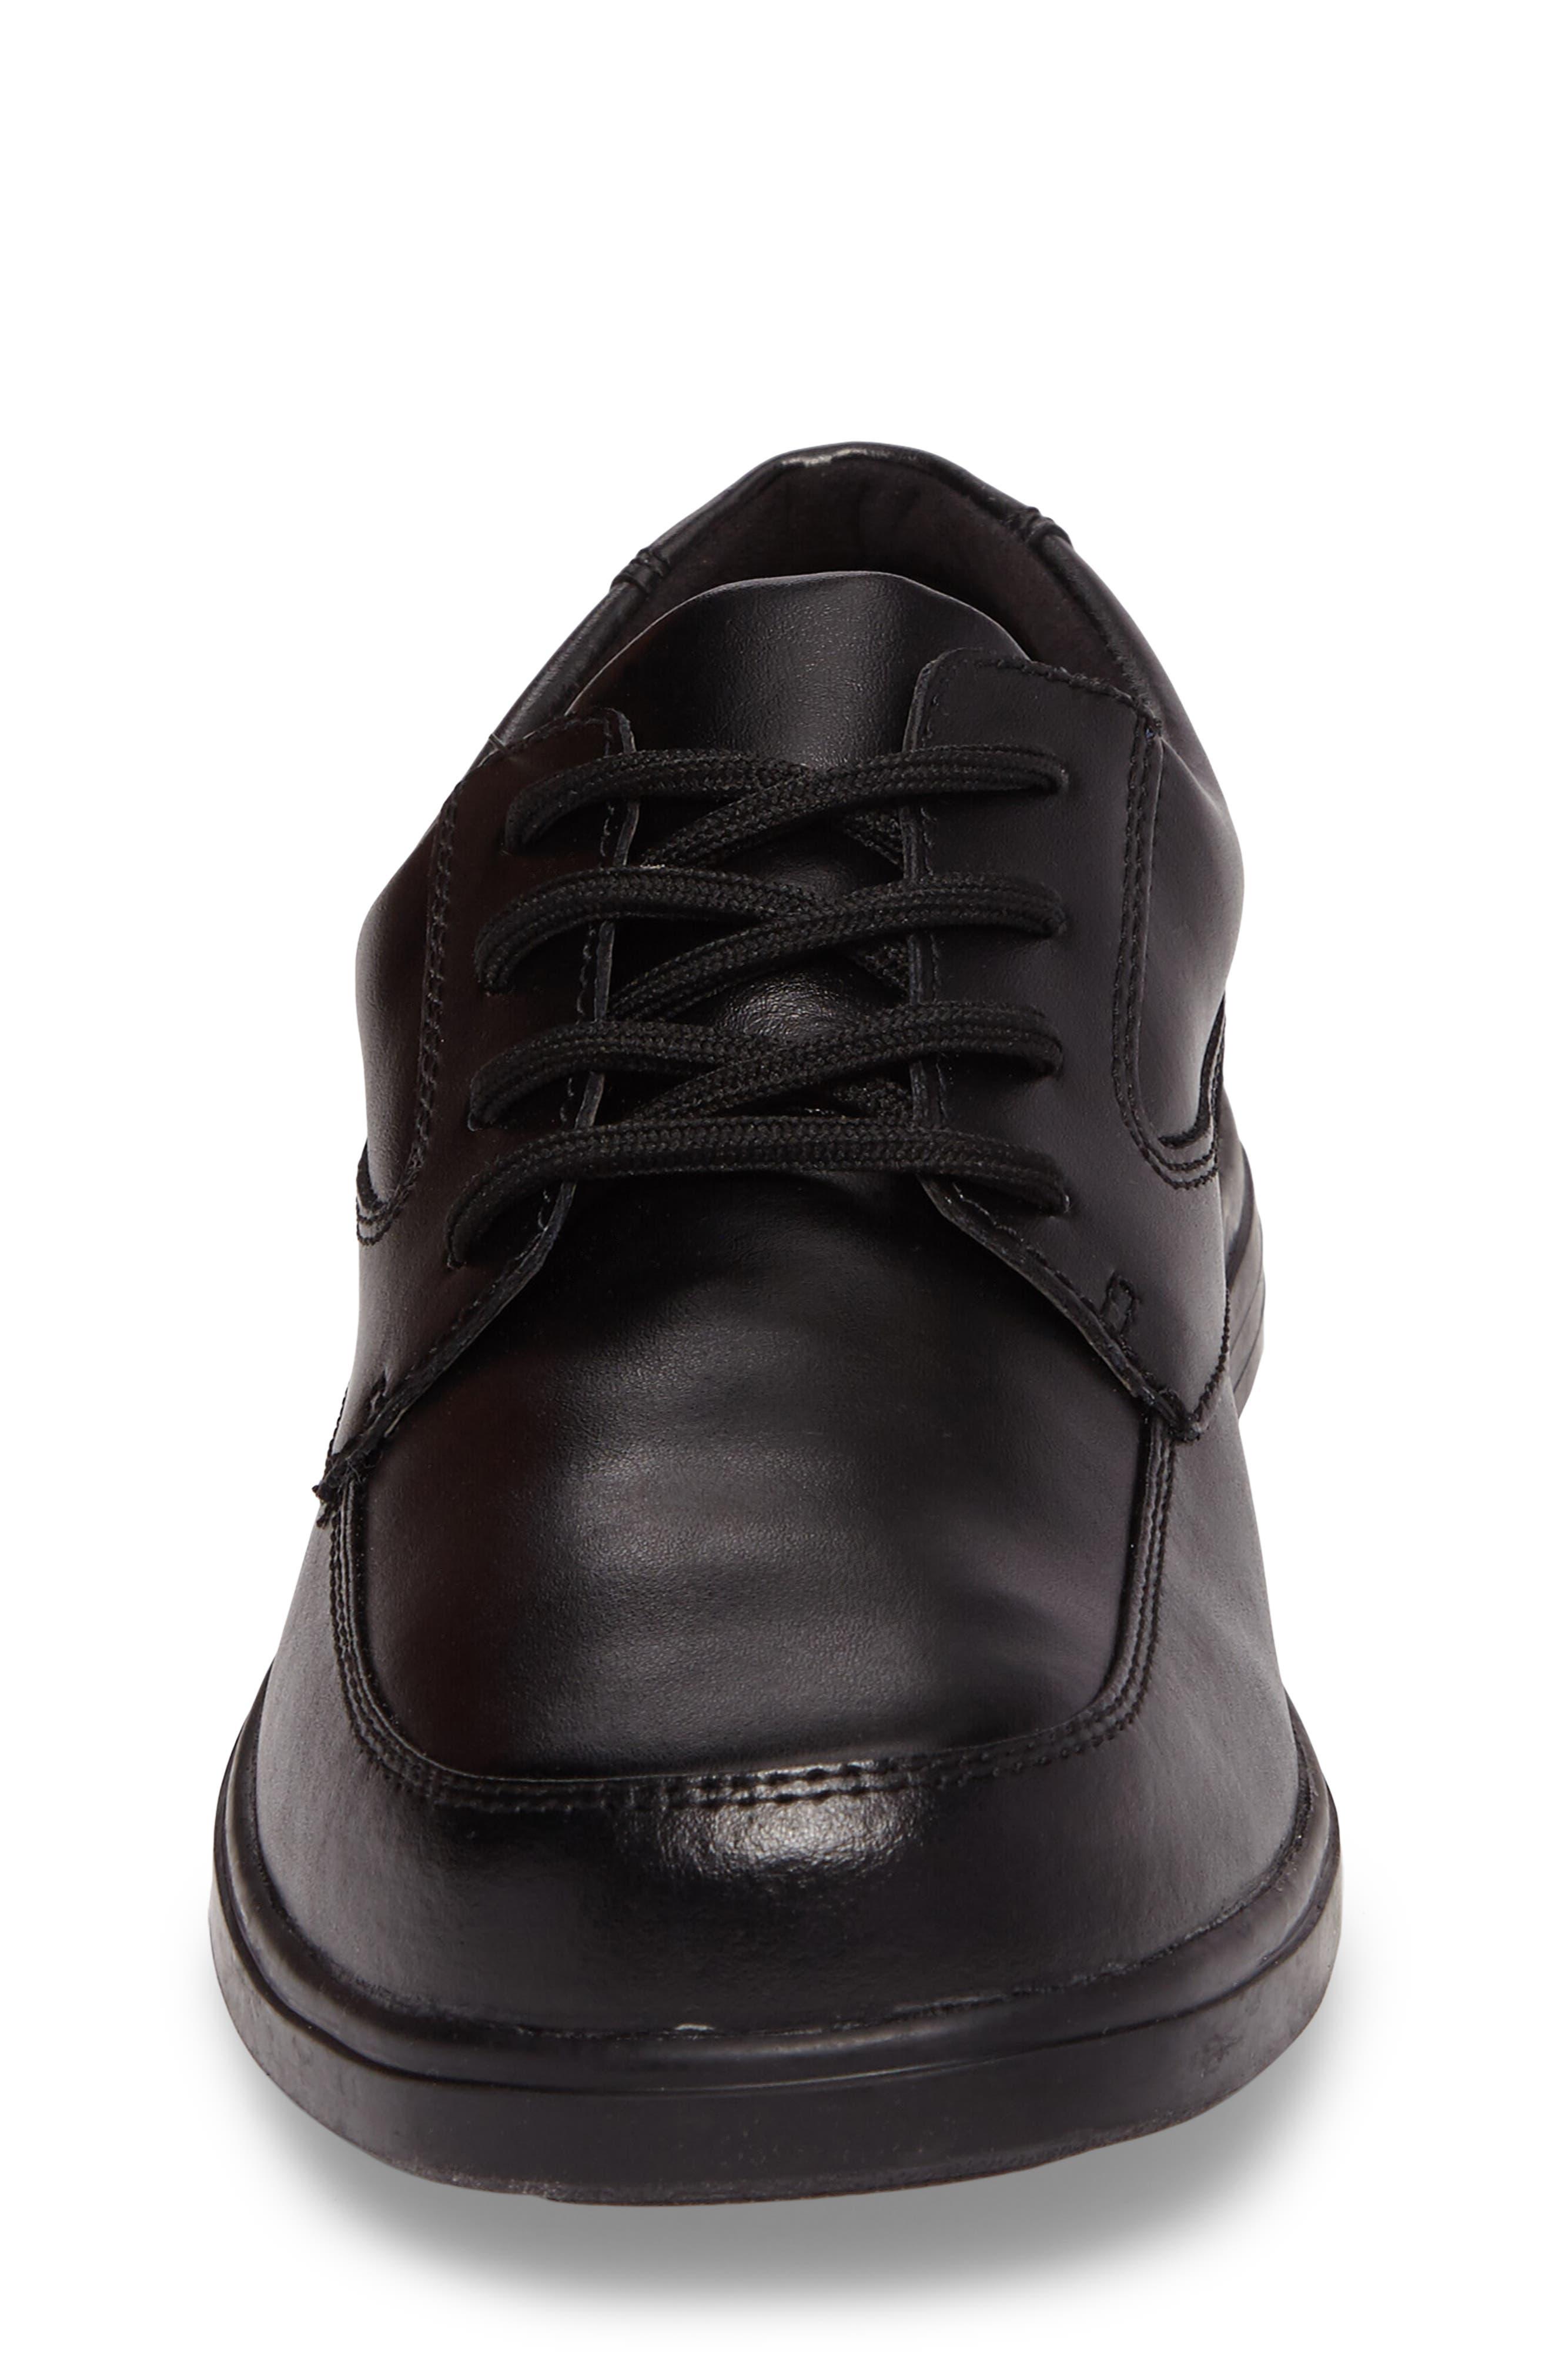 Ty Dress Shoe,                             Alternate thumbnail 4, color,                             BLACK LEATHER